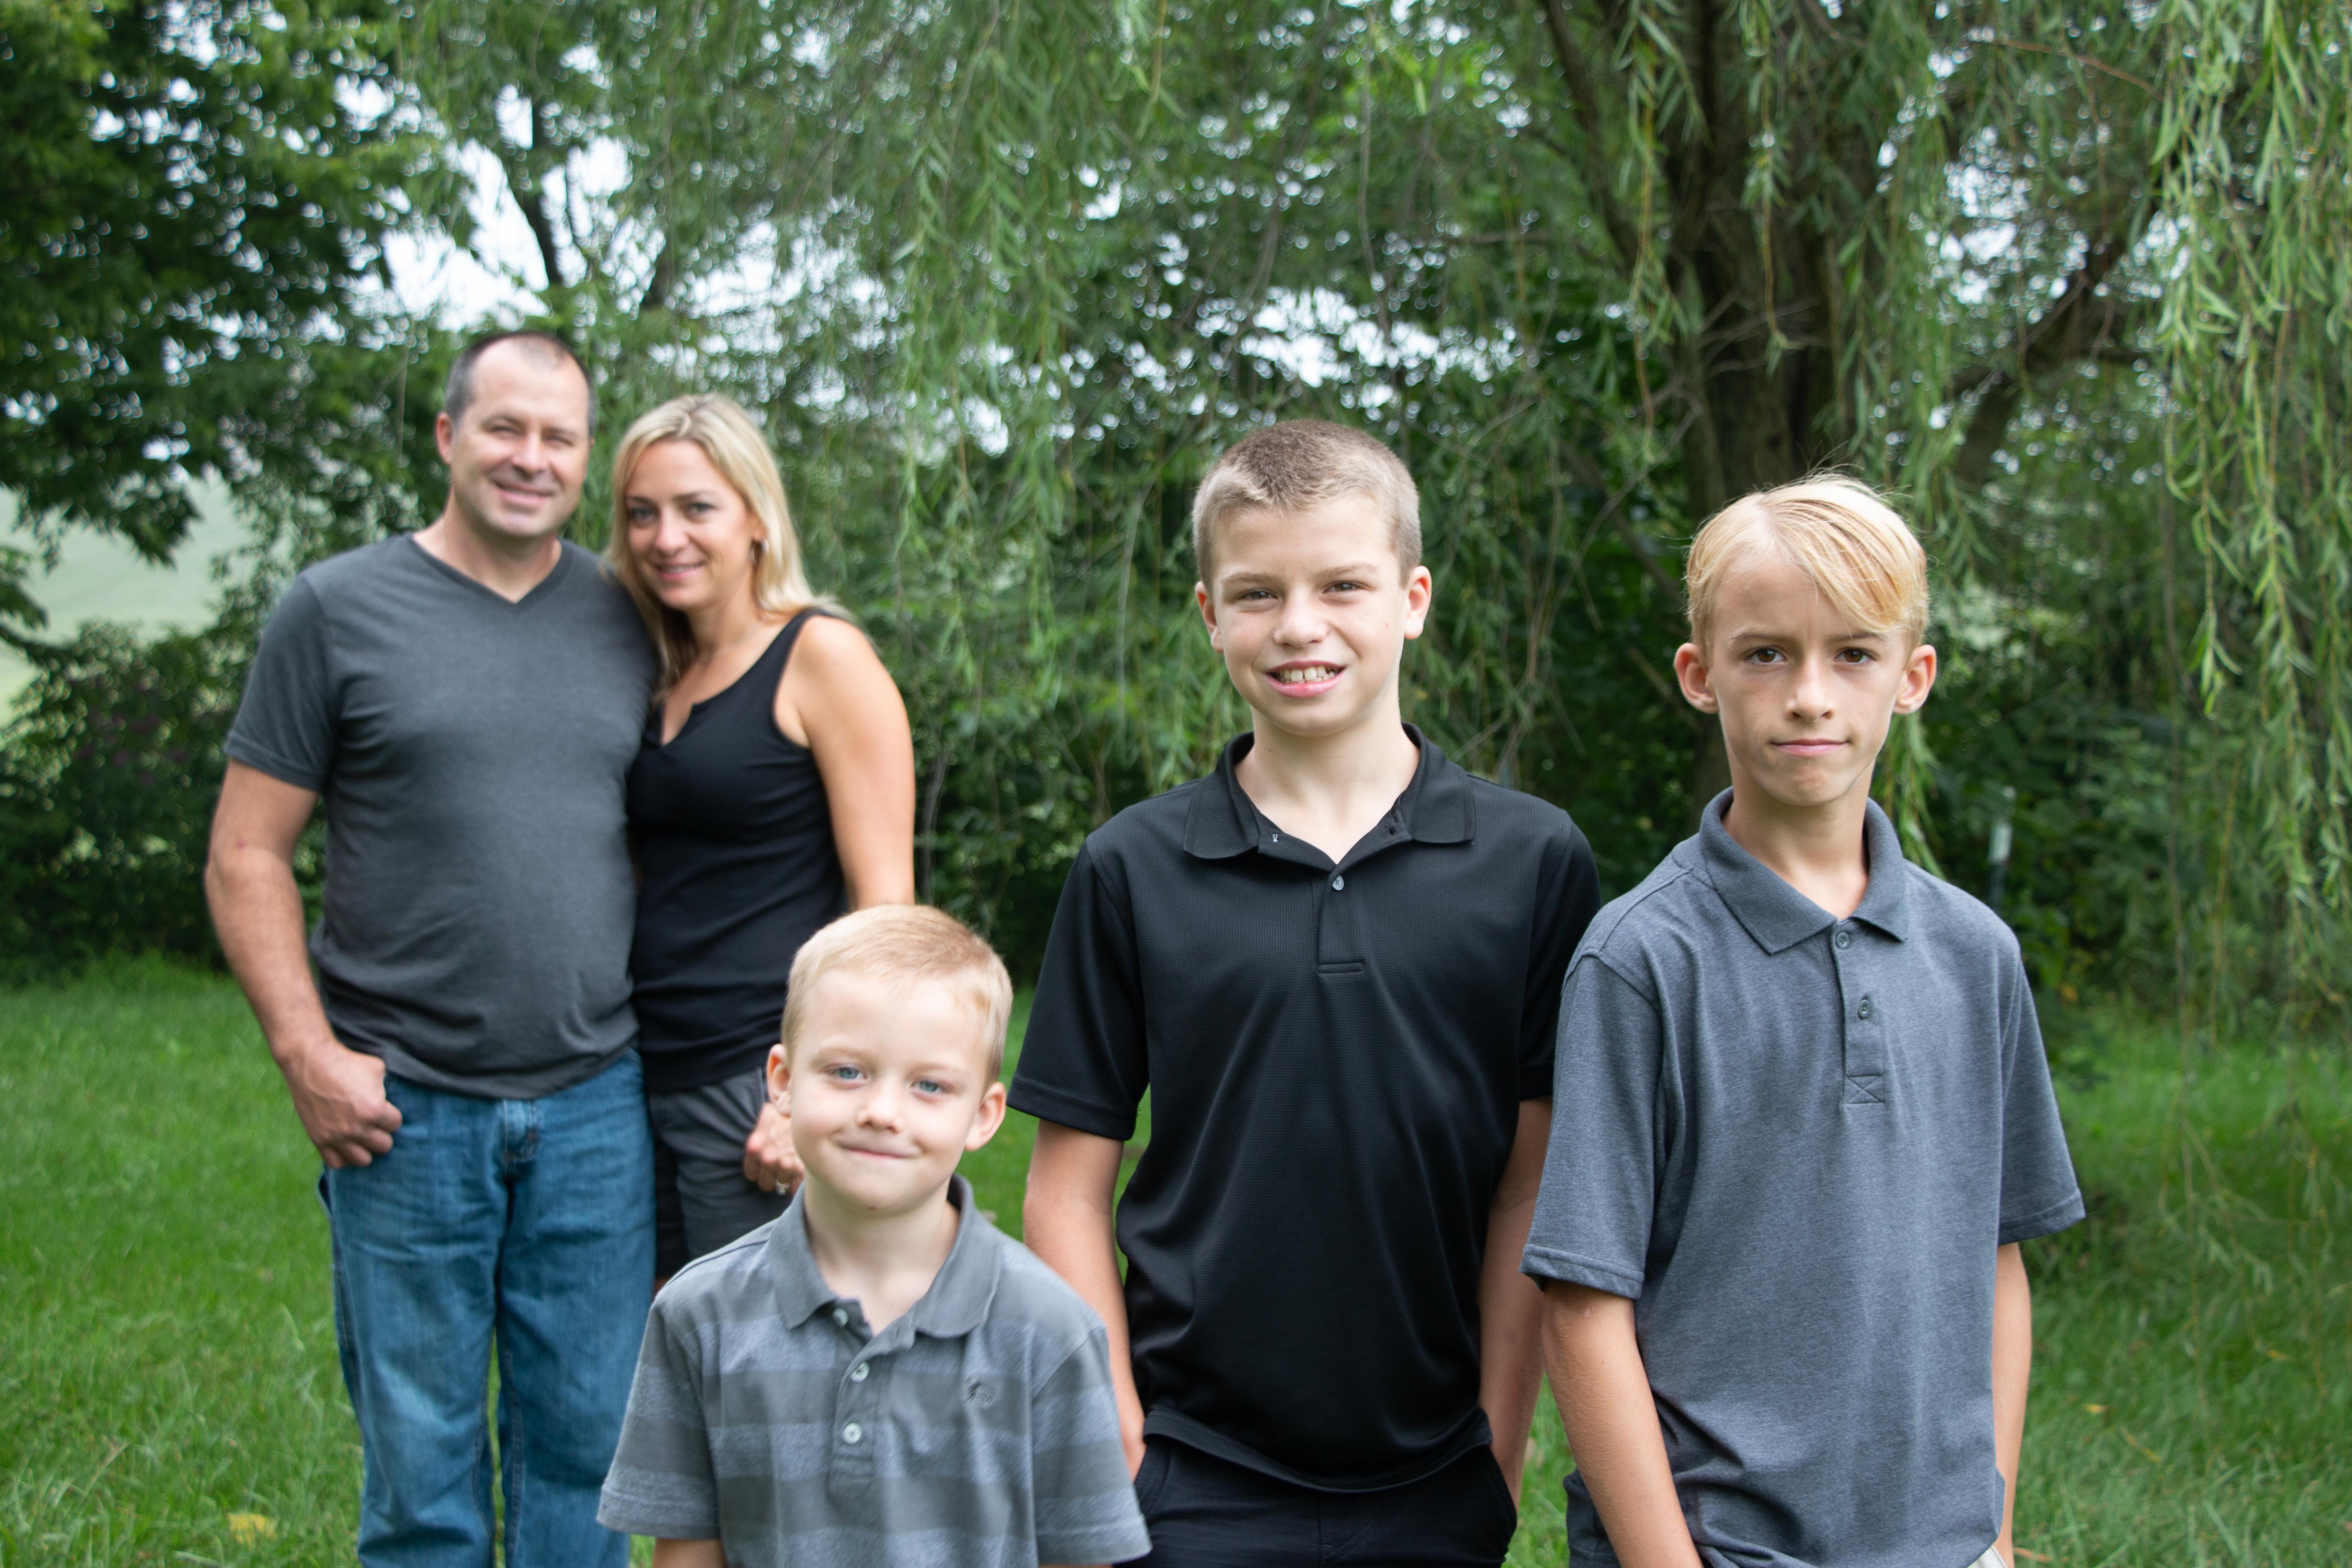 Family Photos Session